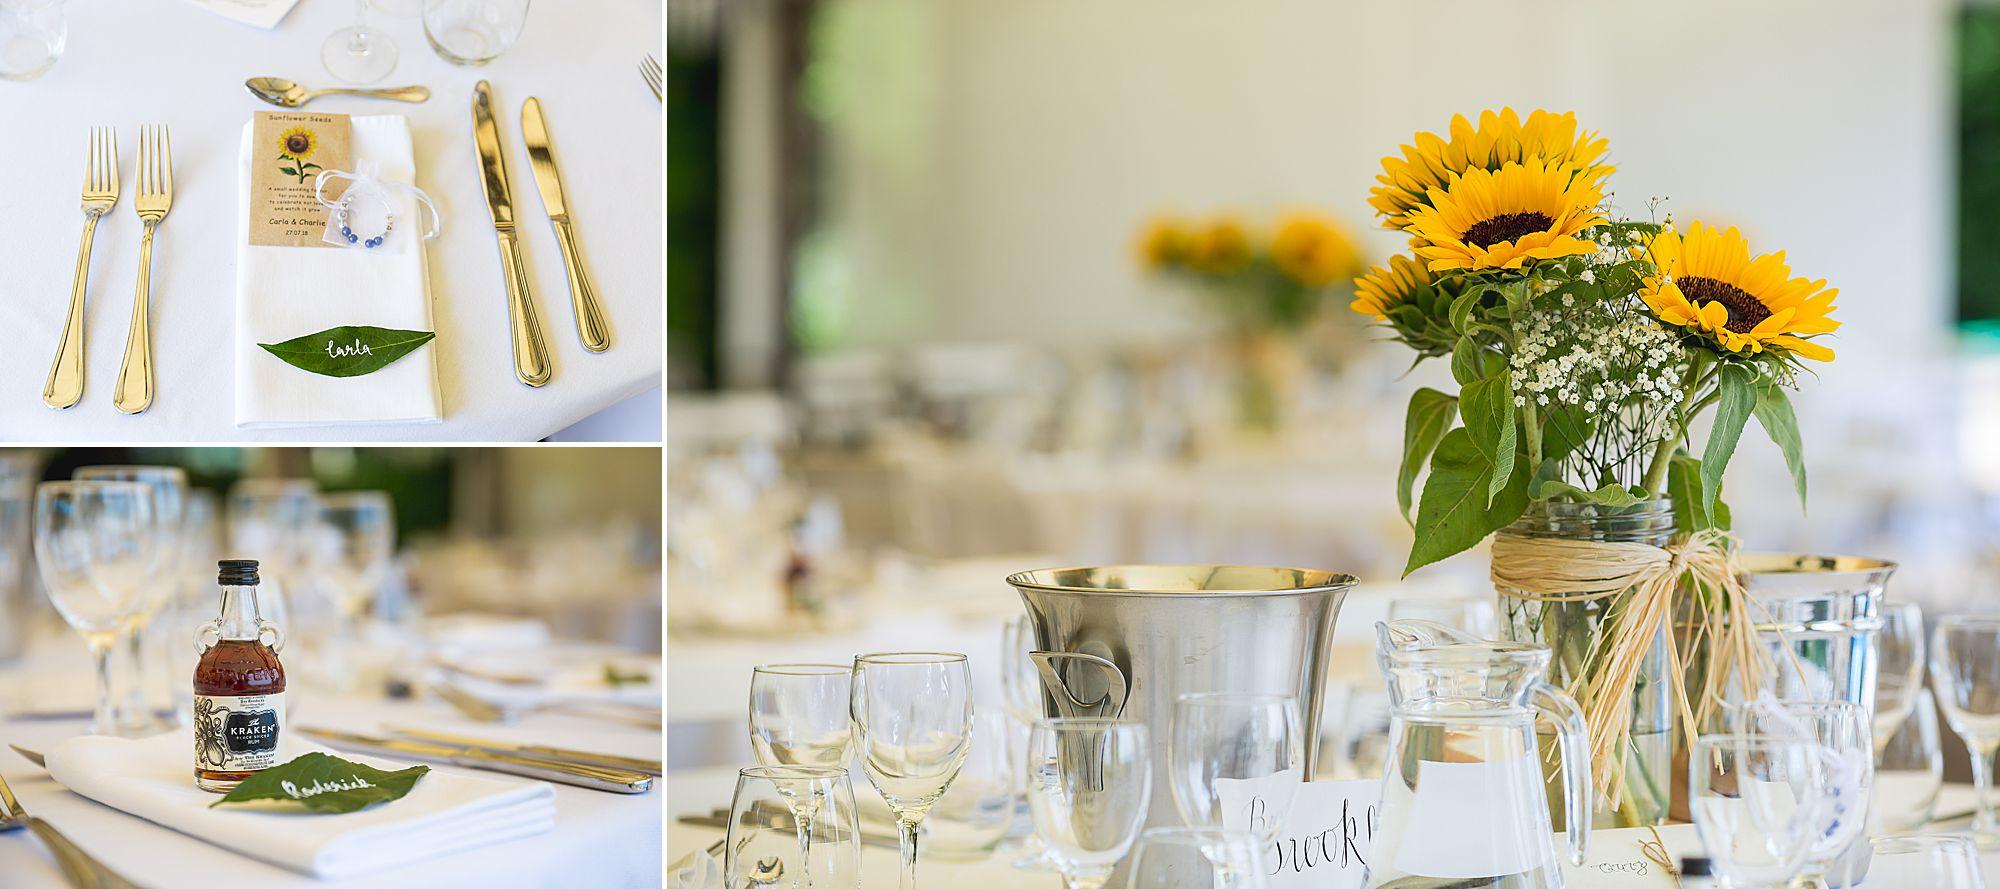 tables at Chateau Brametourte wedding